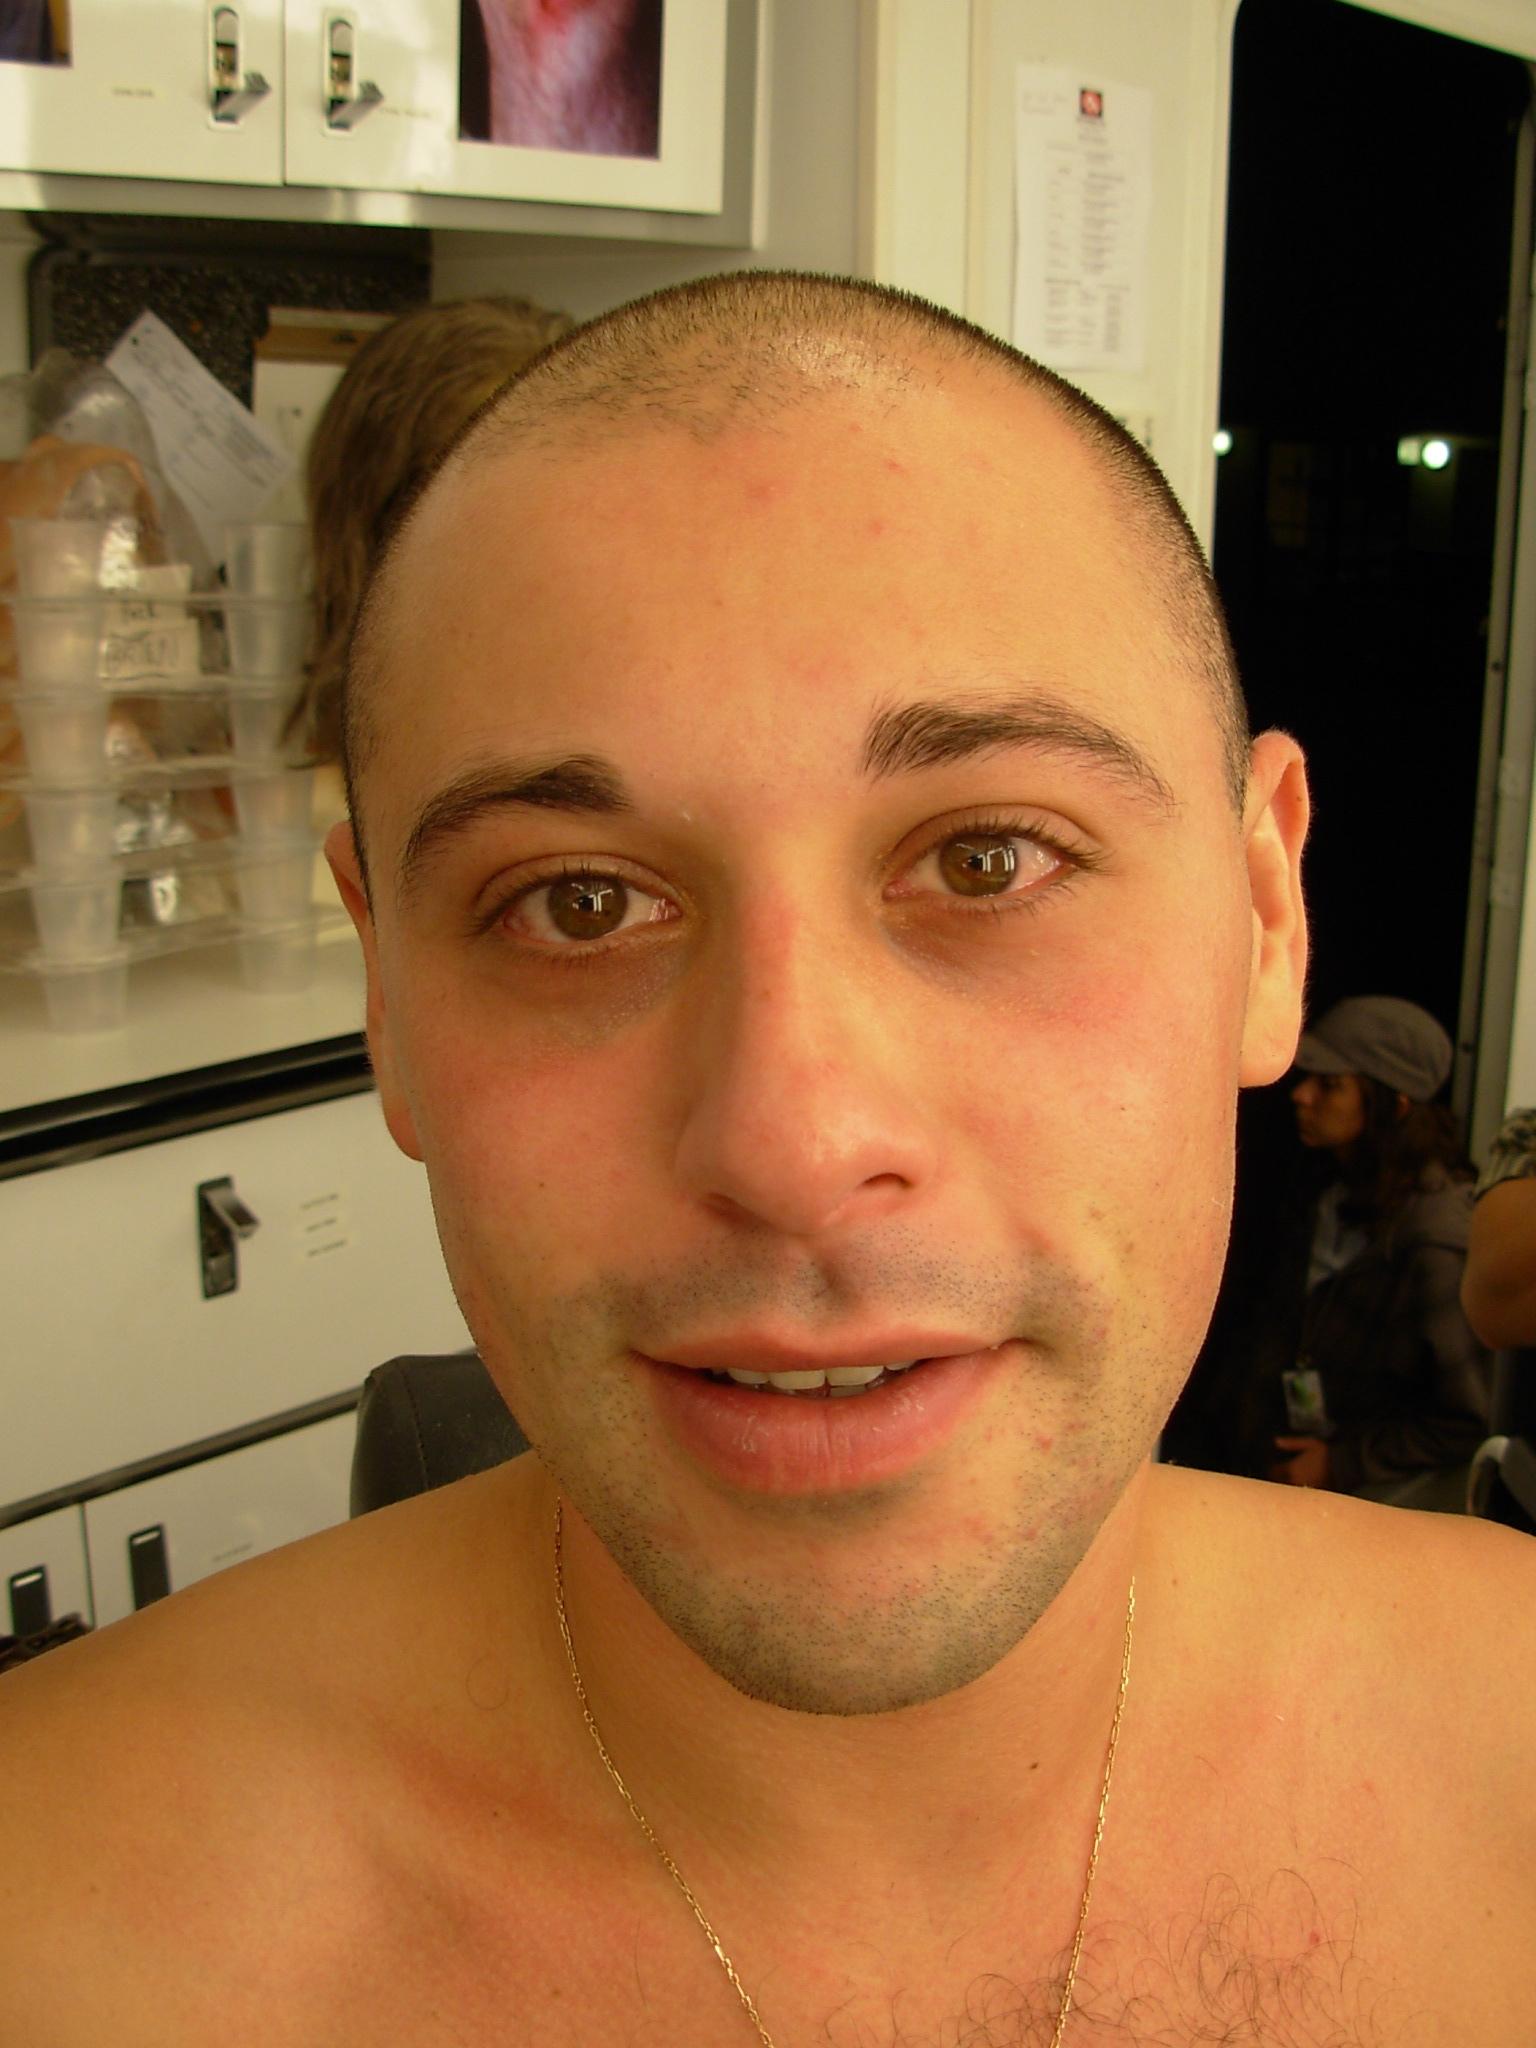 Caveman Ben Before